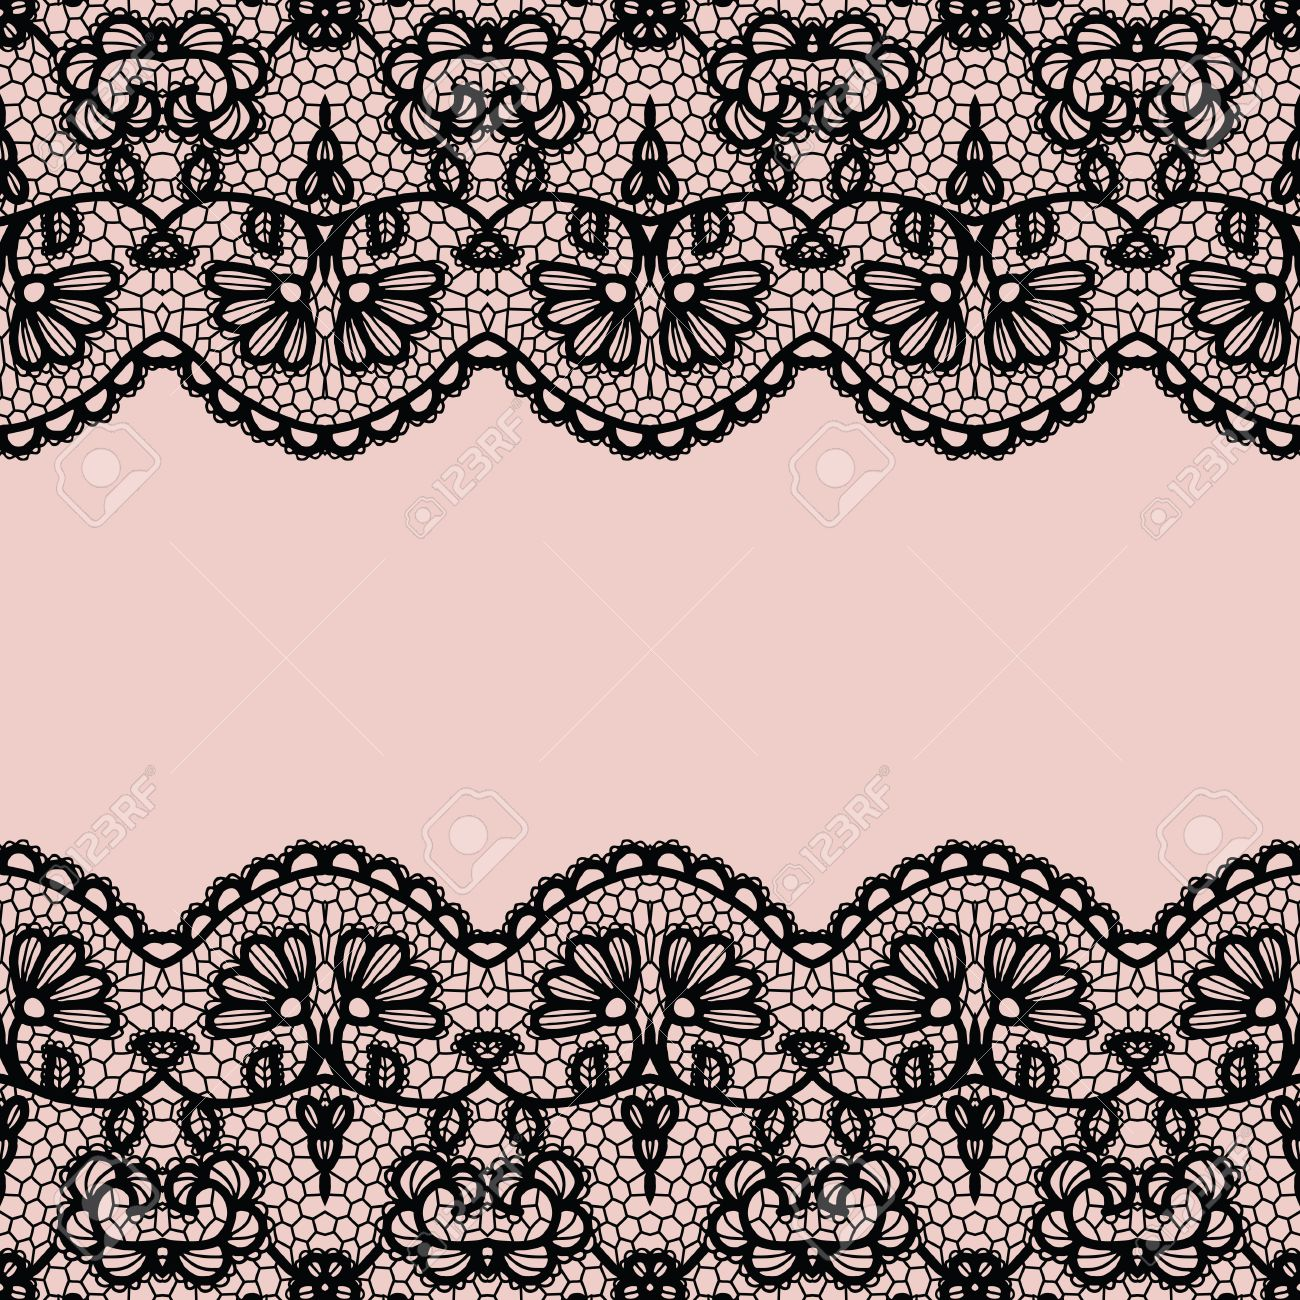 lace border vector illustration black lacy vintage elegant rh 123rf com gold lace border vector gold lace border vector